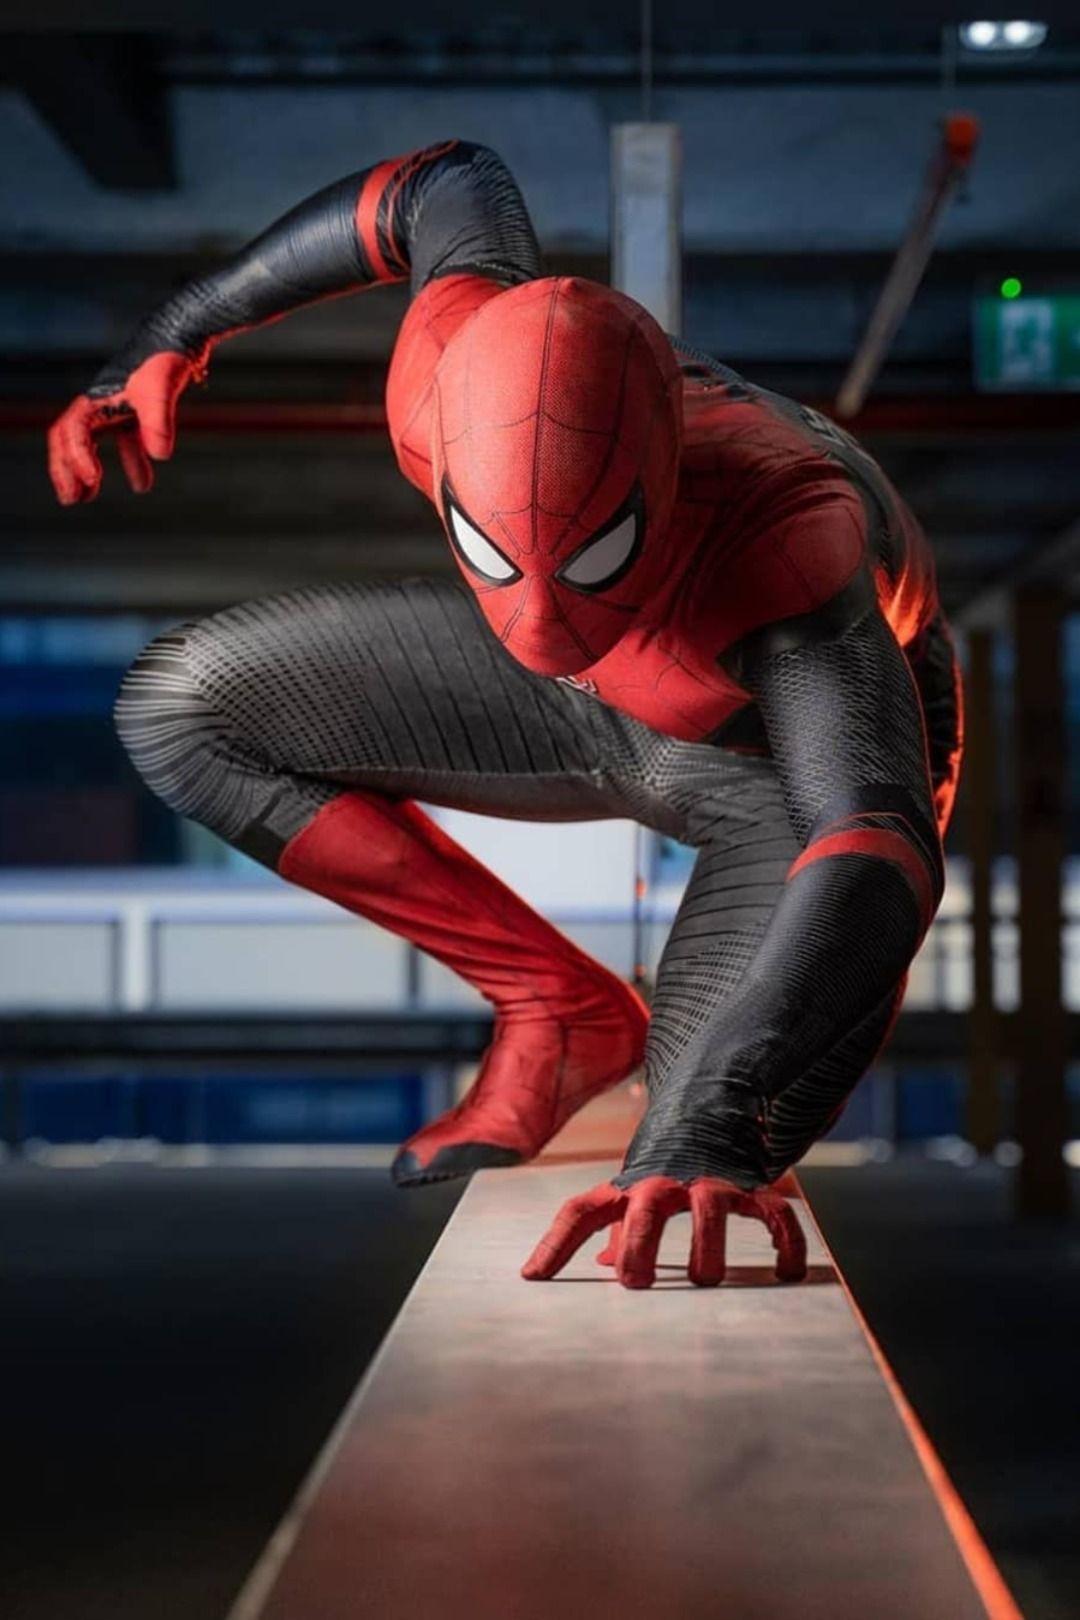 Spiderman Black Suit Spiderman Spiderman Black Suit Marvel Spiderman Art